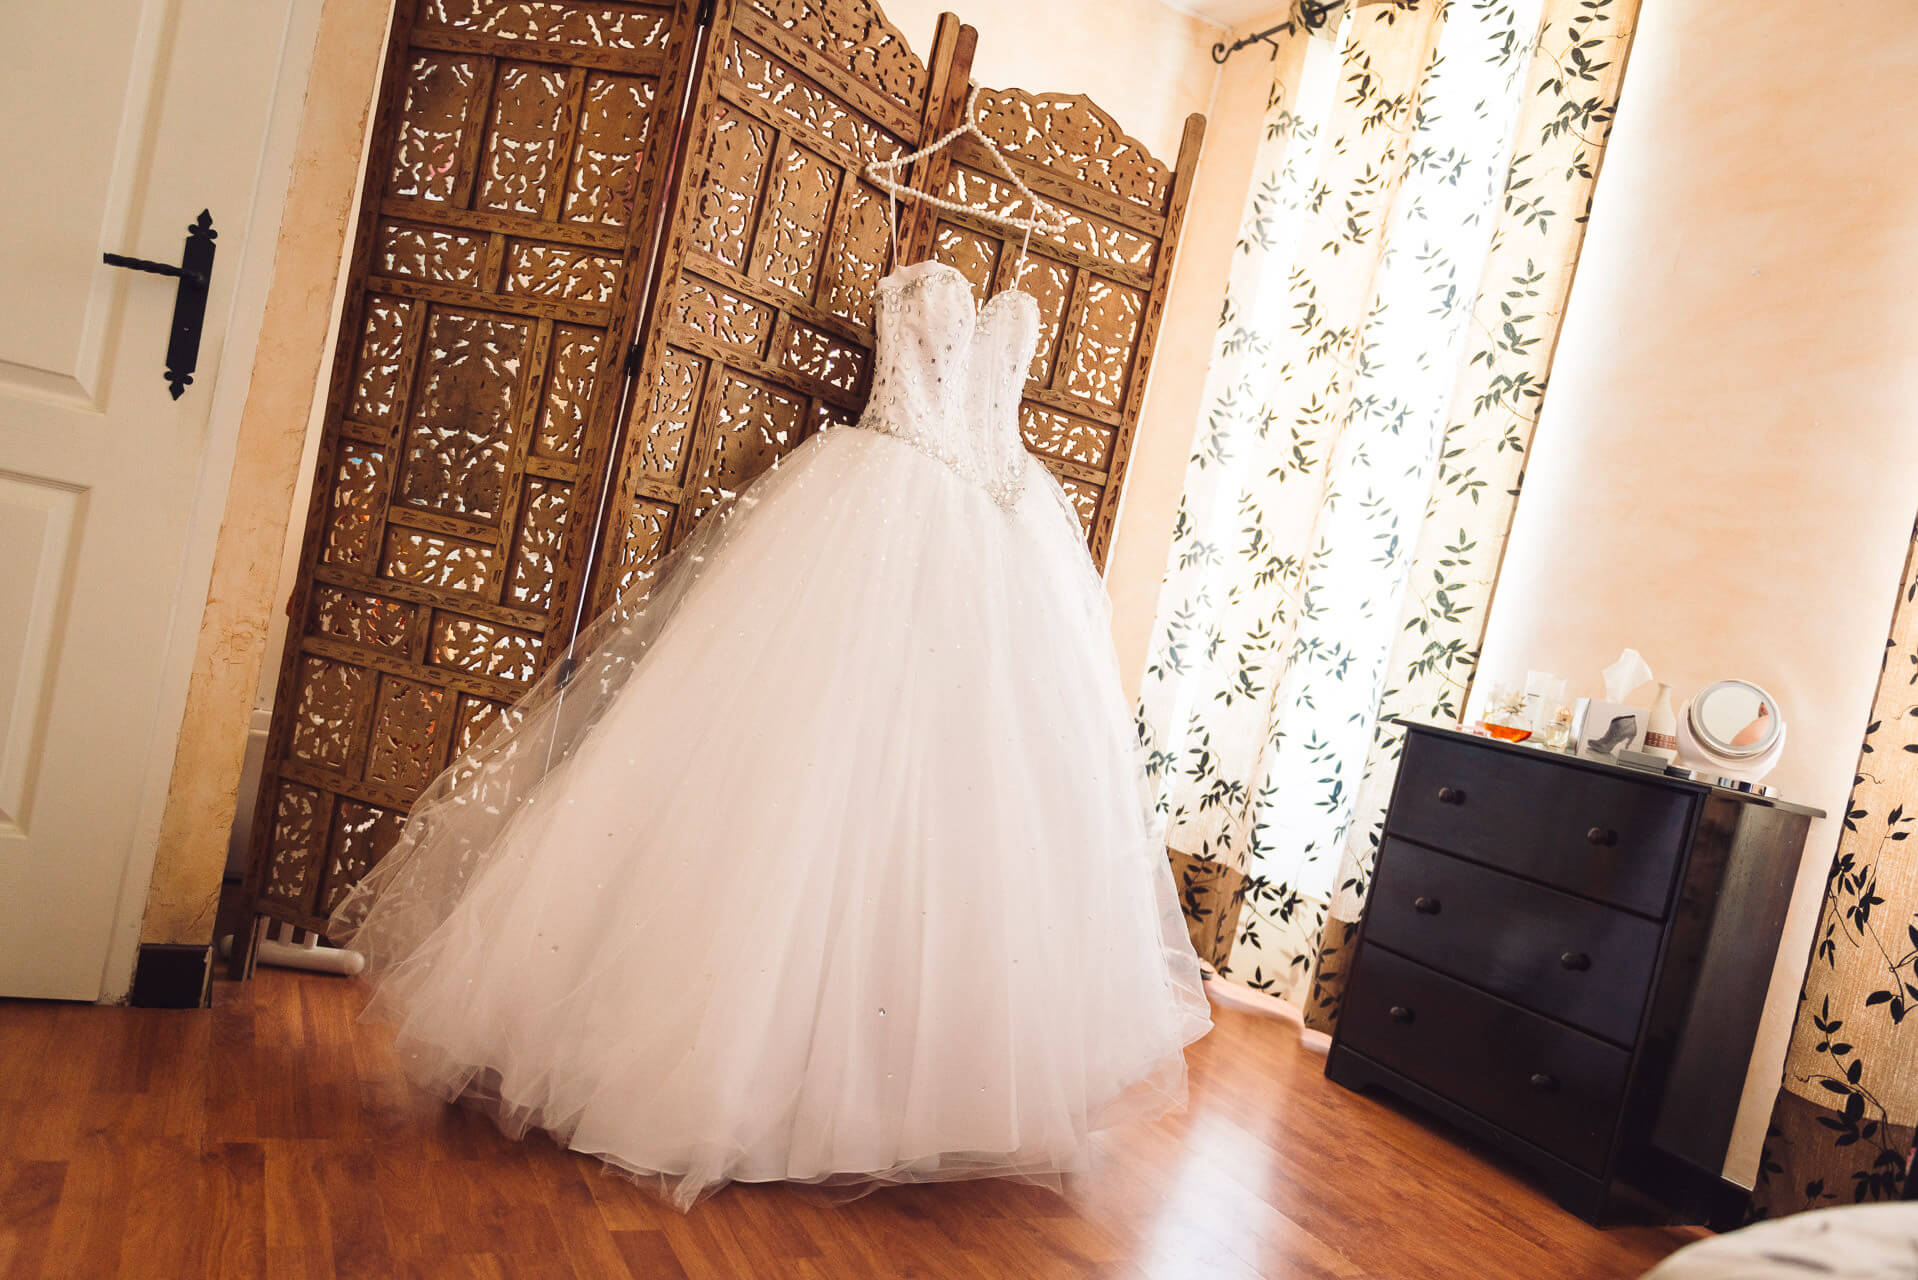 Robe de mariage blanche type bal - Studio Graou photographe mariage